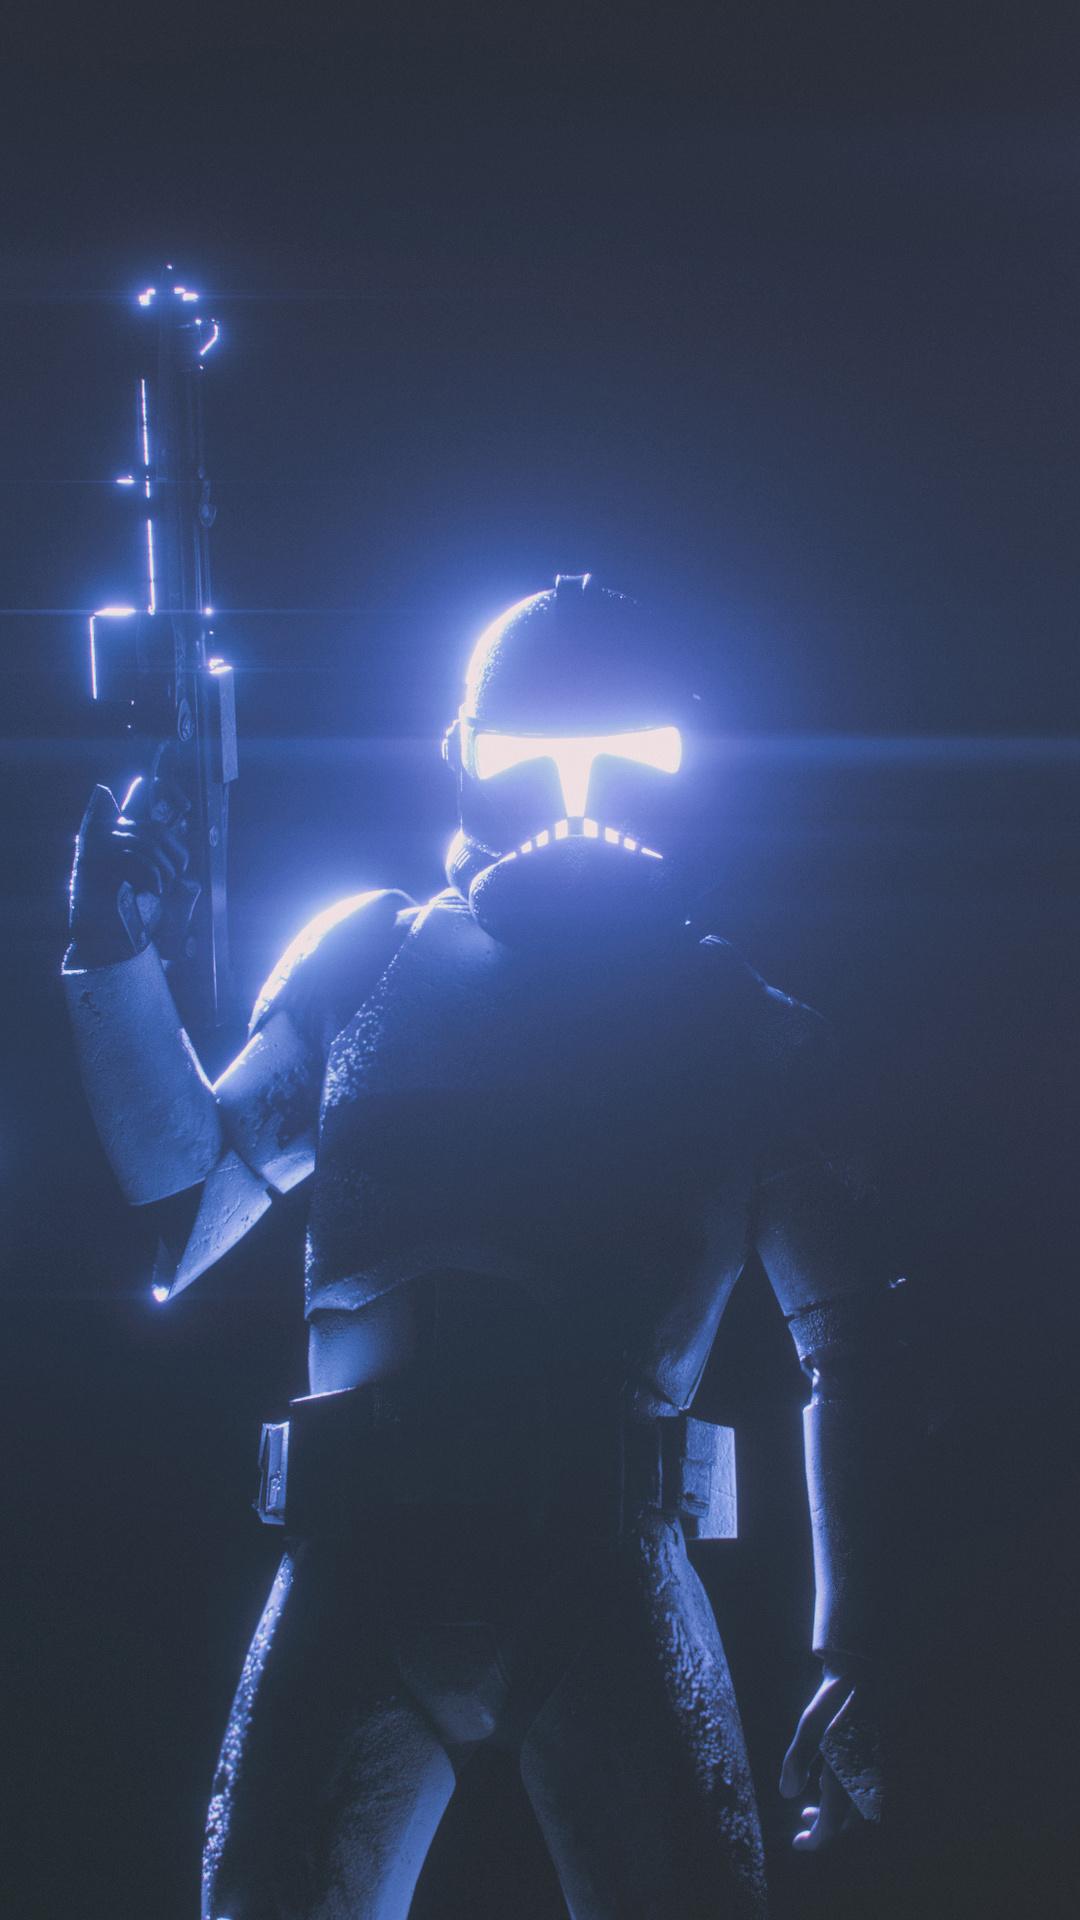 clone-trooper-star-wars-yp.jpg